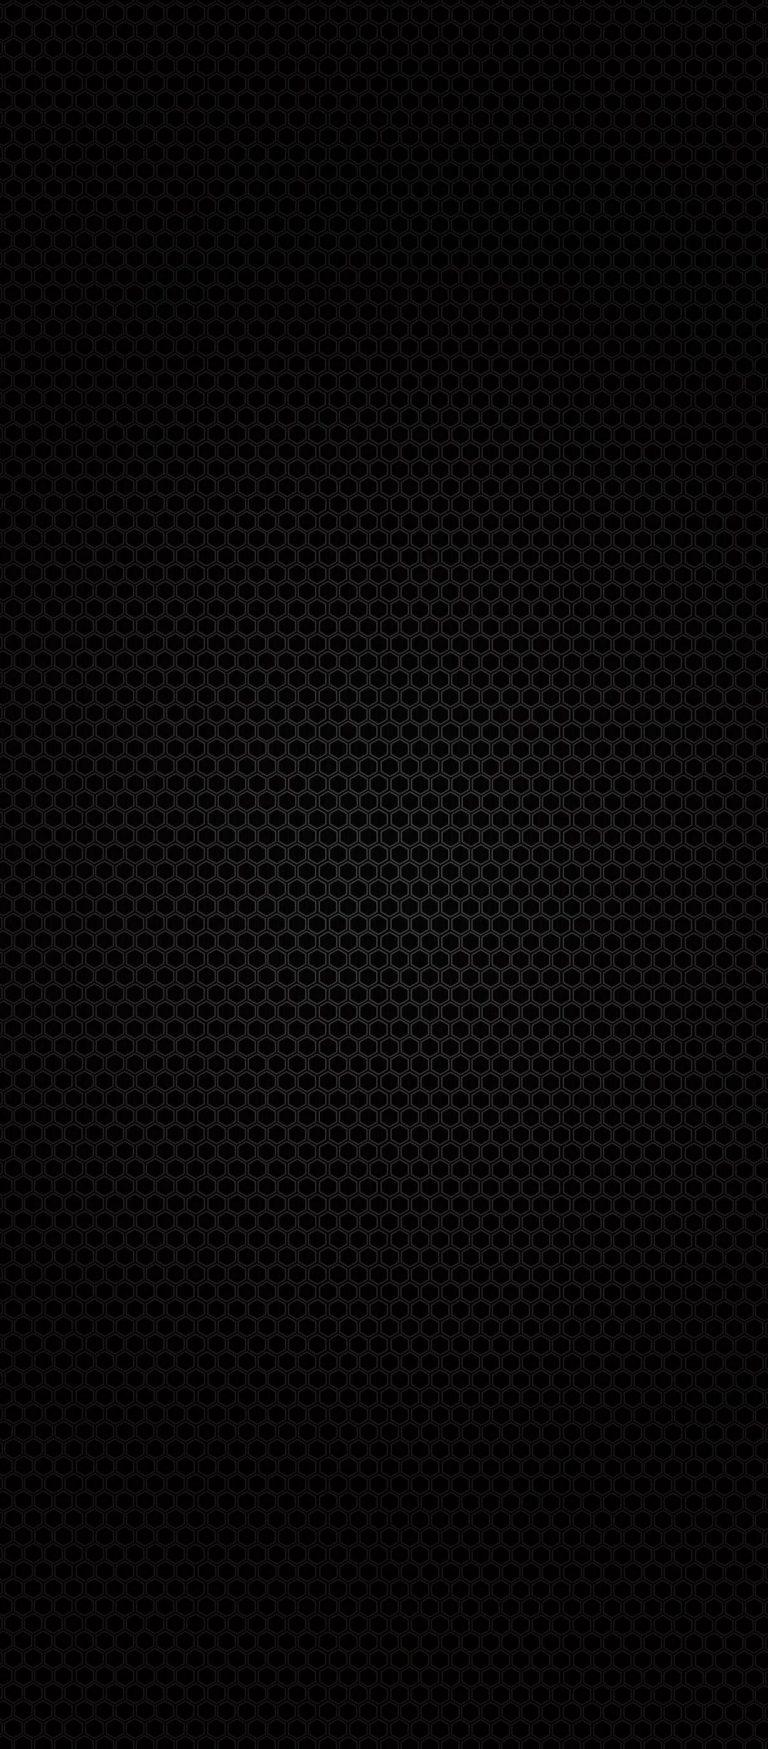 Mesh Texture Dark 1080x2460 768x1749